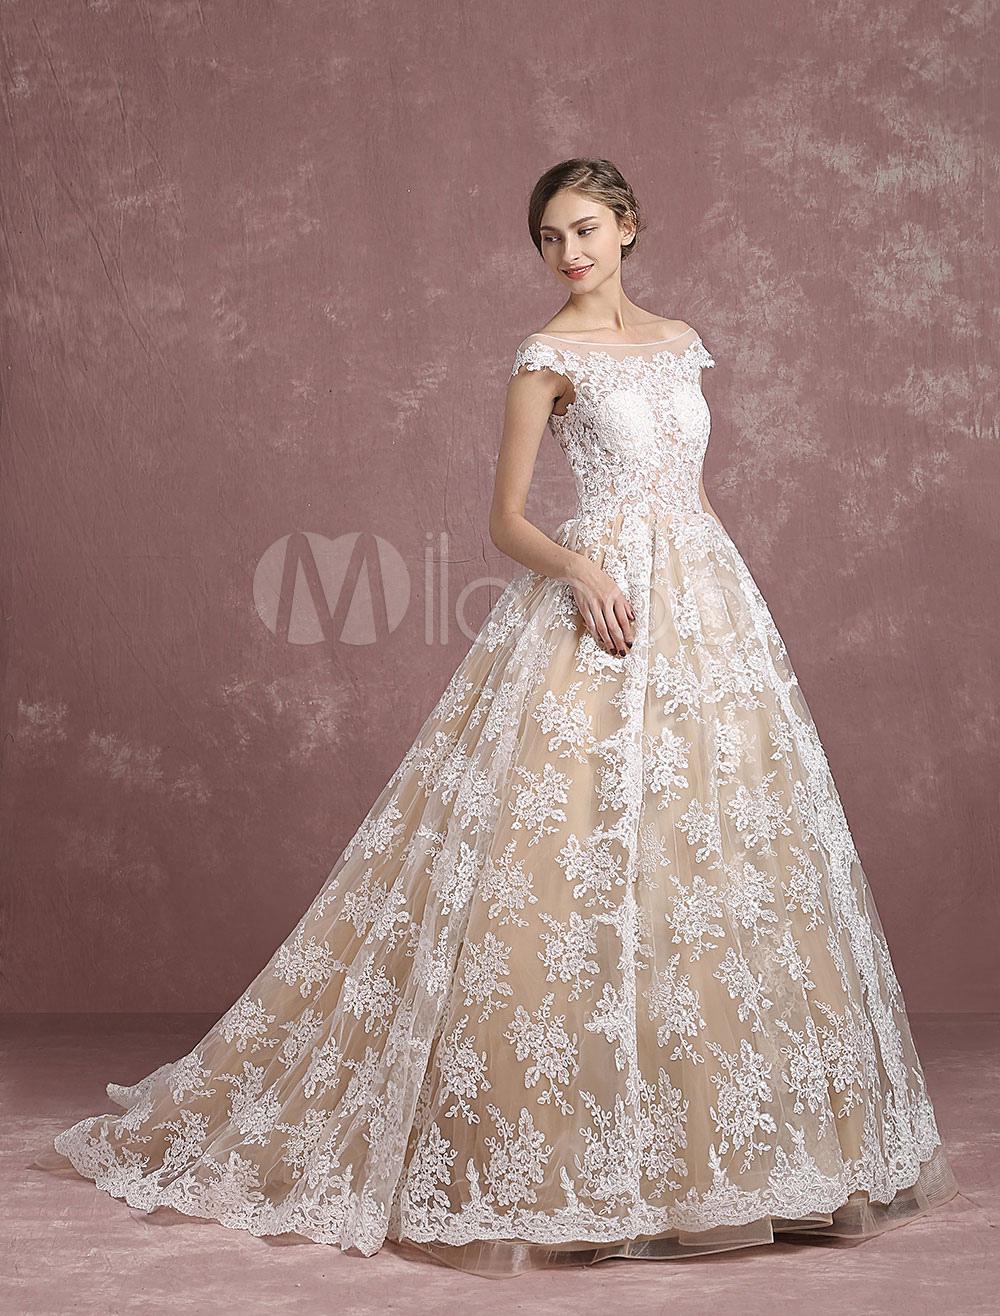 Lace Wedding Dress Champagne Bridal Gown Bateau Illusion Neckline